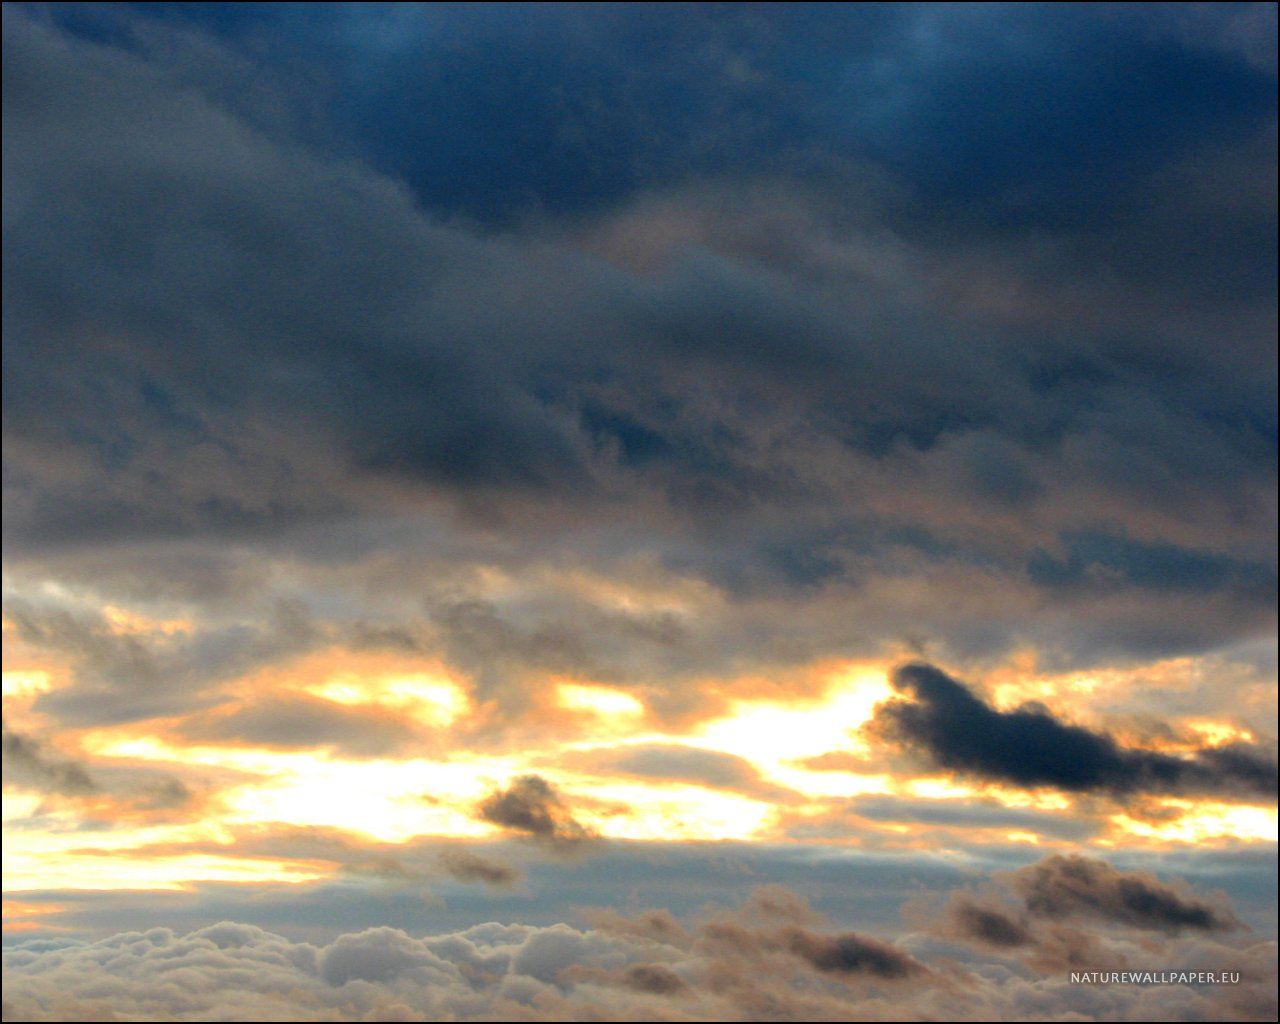 1280x1024 wallpaper Dark Sky Wallpaper Background 1280x1024